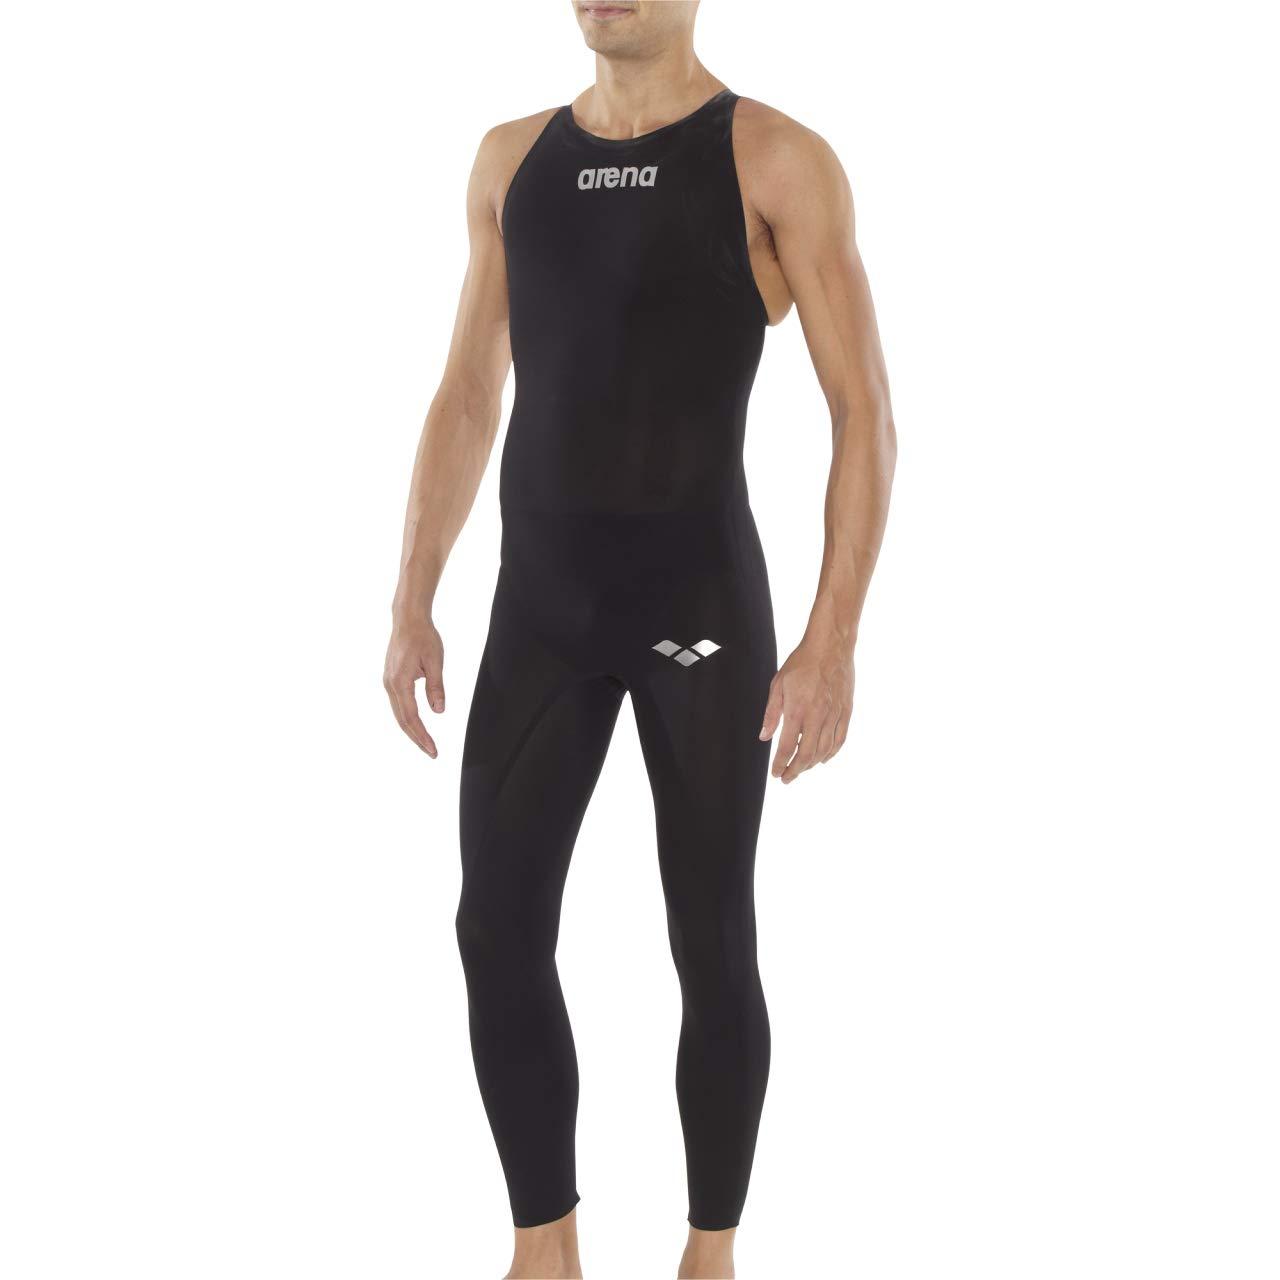 arena Powerskin R-Evo+ Open Water Closed Back Men's Racing Swimsuit, Black, 28